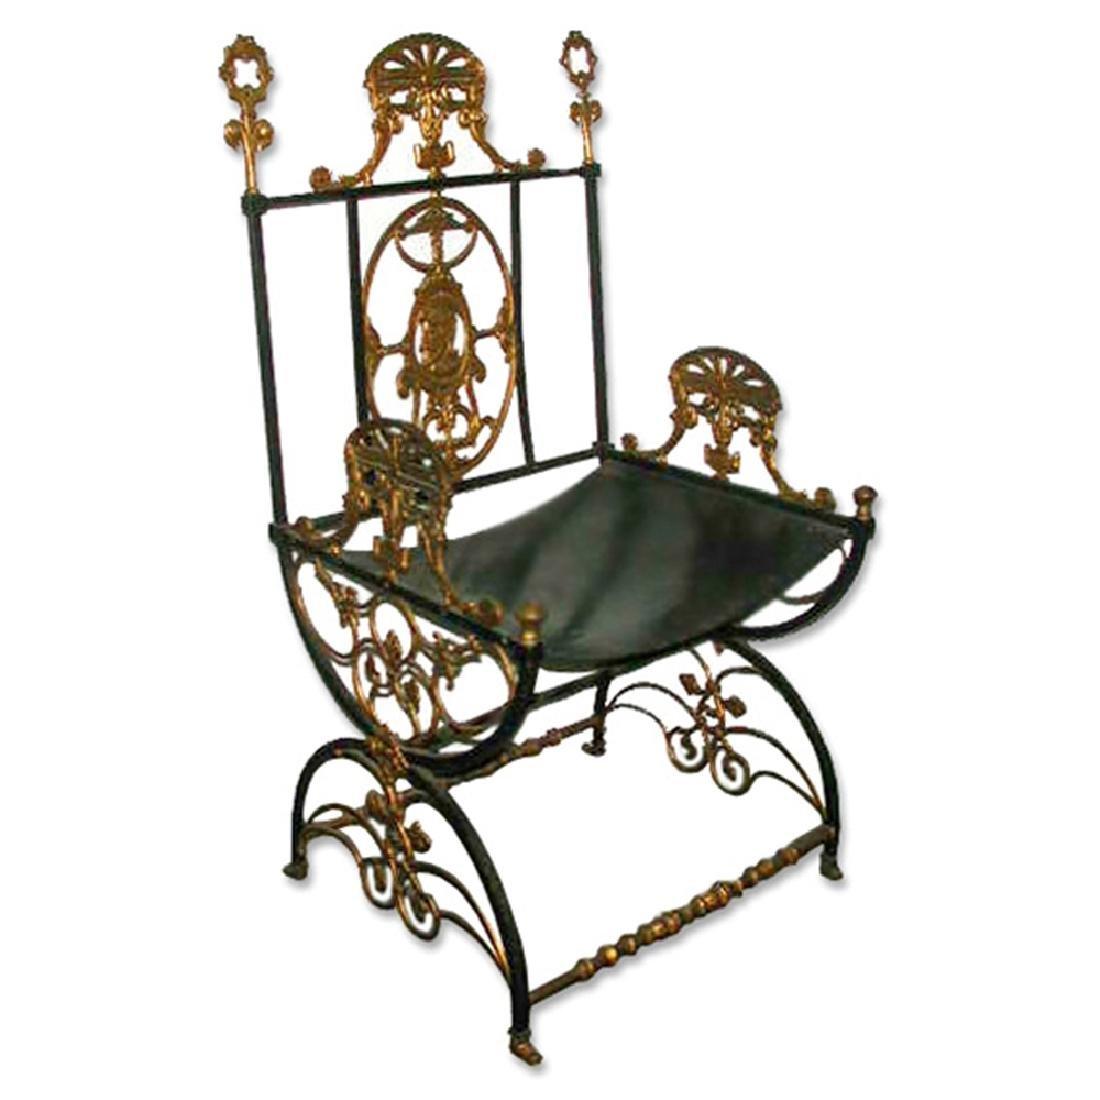 5040 Antique 19th C. Iron & Bronze Chair by Oscar Bach